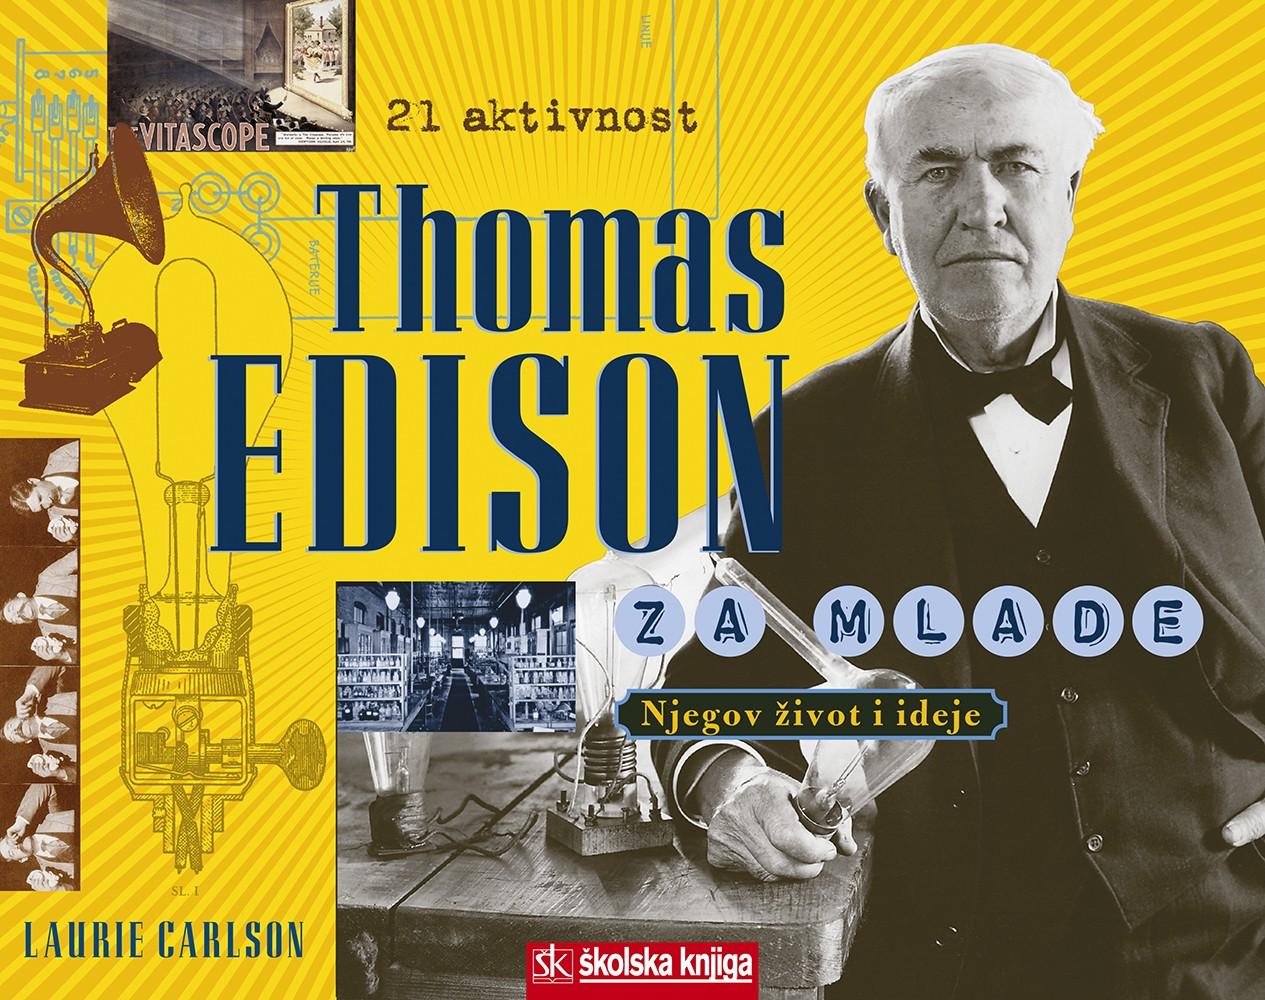 Thomas Edison za mlade - Njegov život i ideje kroz 21 aktivnost